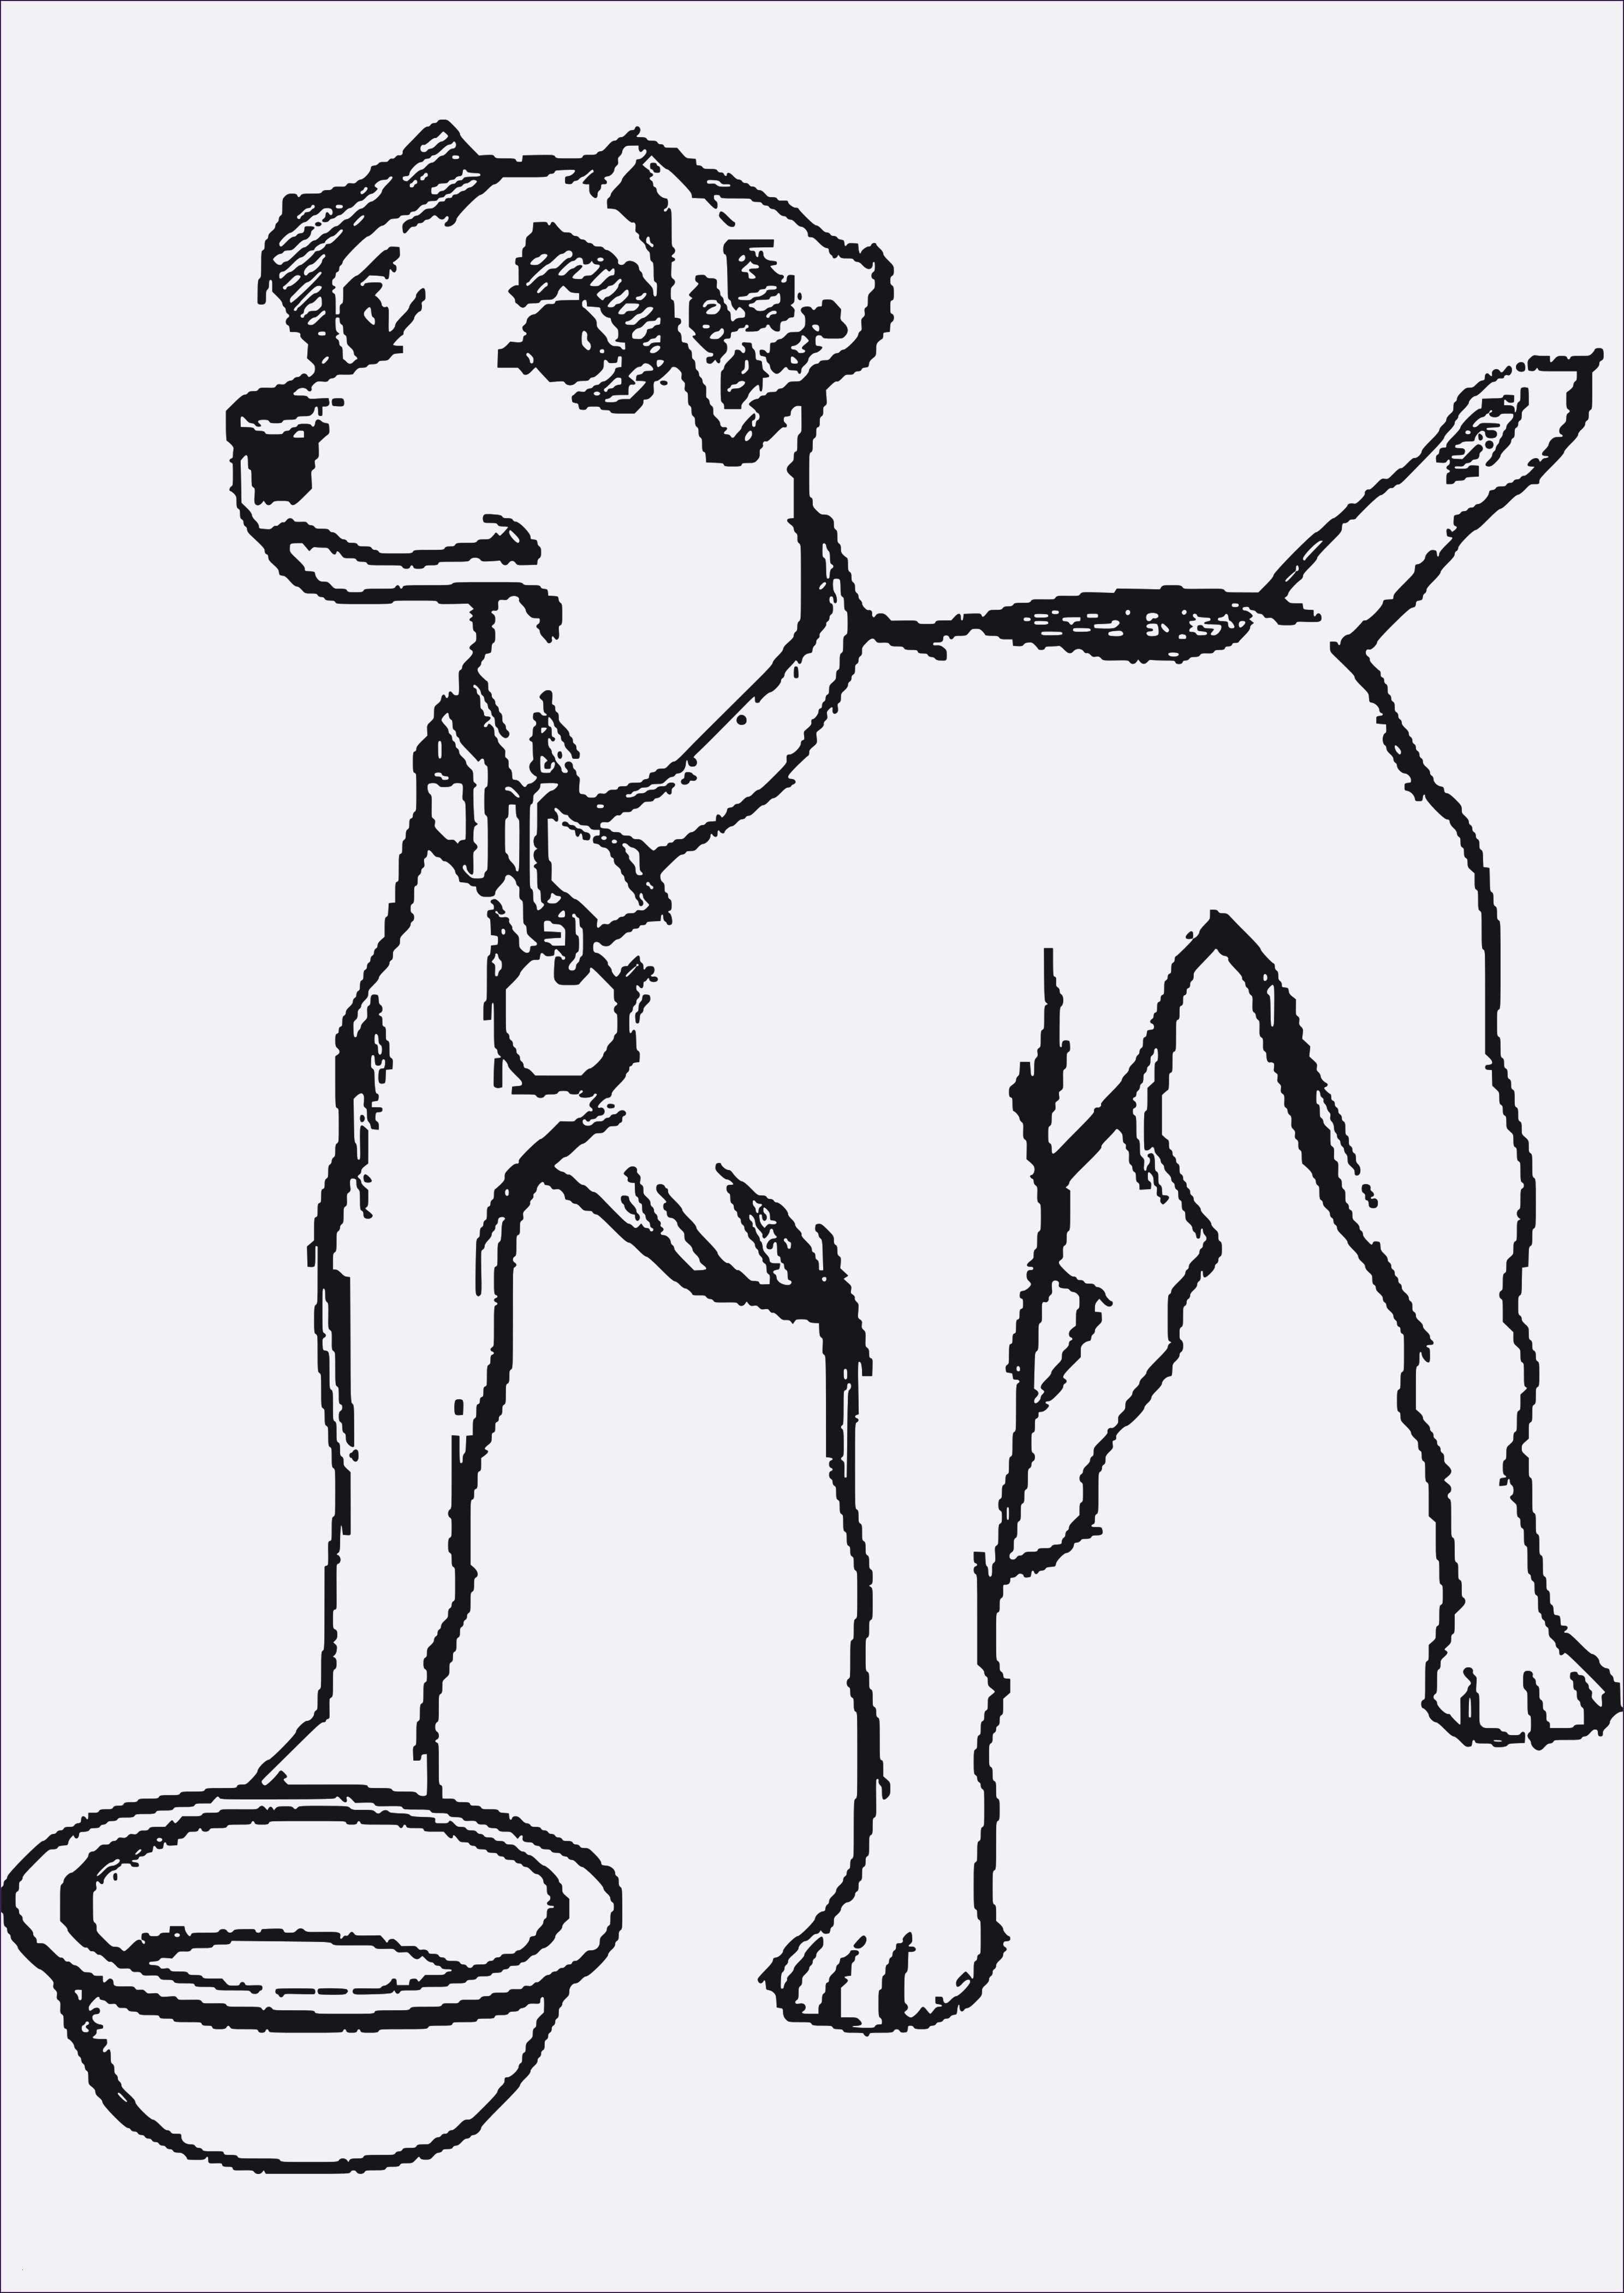 55 Neu Ausmalbilder Hundewelpen Mit Bildern Ausmalbilder Hunde